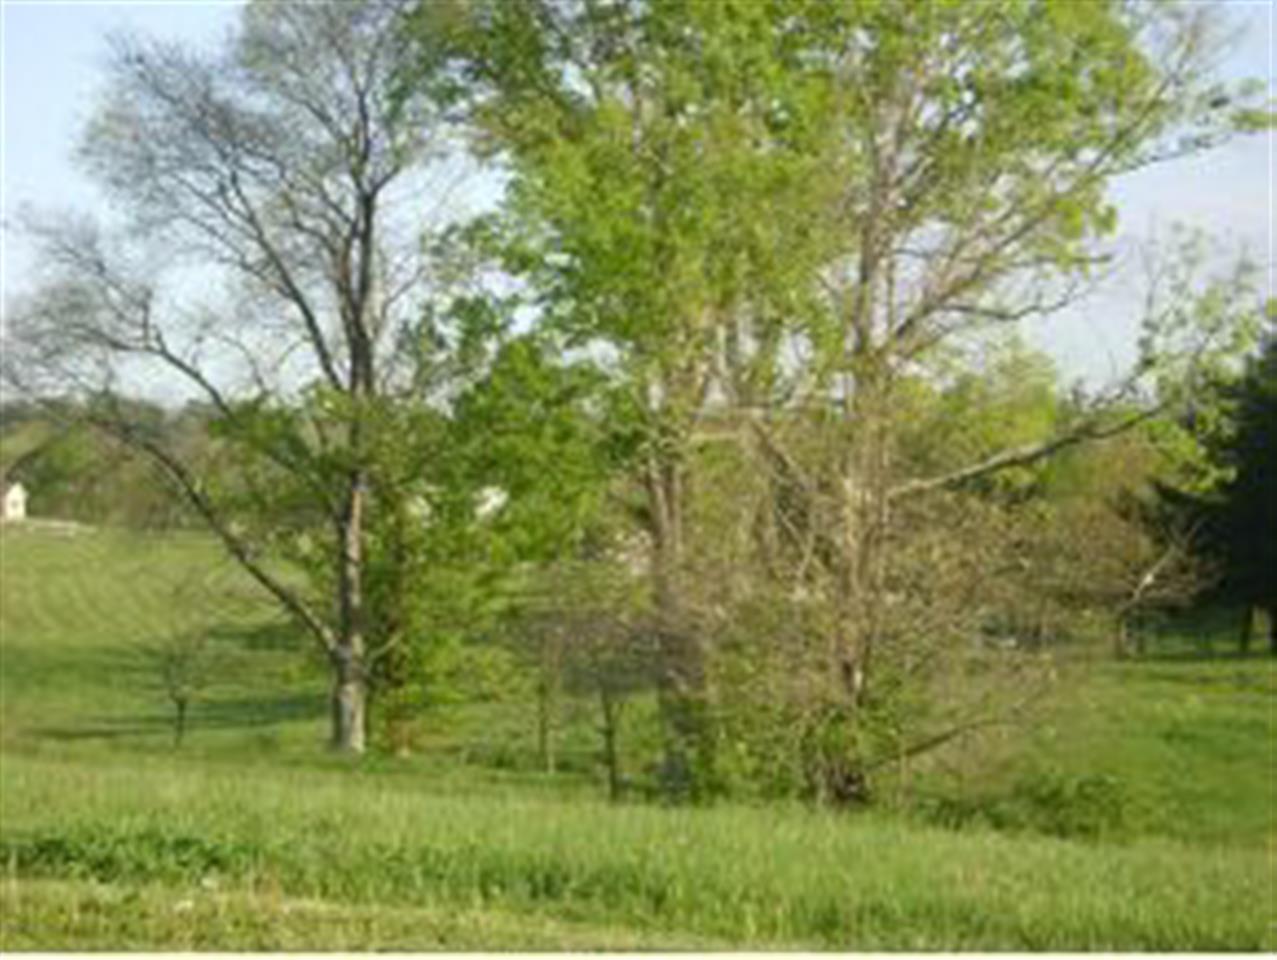 Real Estate for Sale, ListingId: 26990802, Bloomington,IN47401